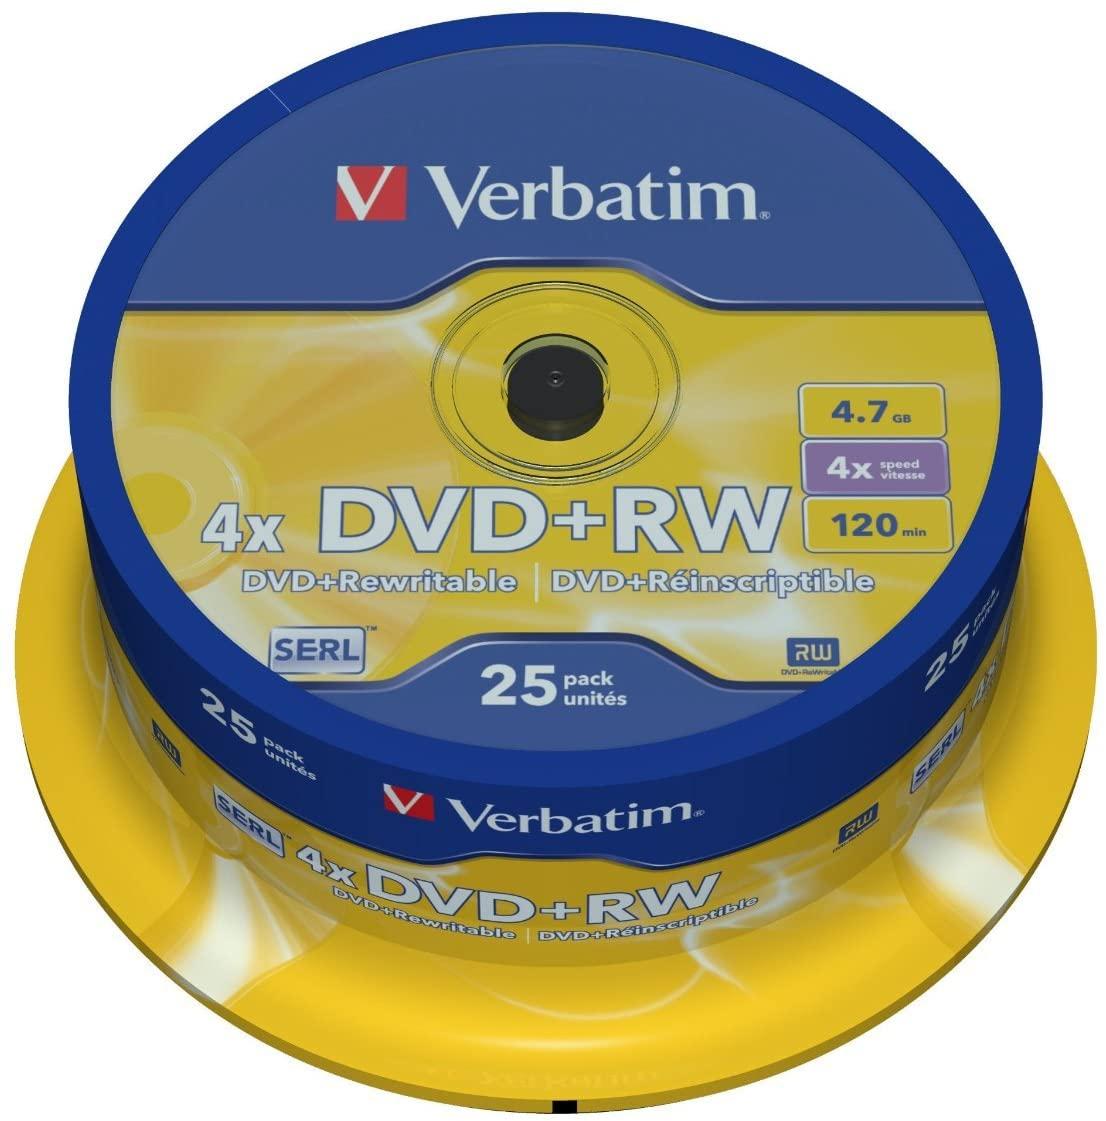 Verbatim 4x Speed DVD+RW Blank DVDs - 25 pack for £6.27 or Verbatim 12x Speed CD-RW Blank CDs 10 pack for £1.97 @ Currys PC World